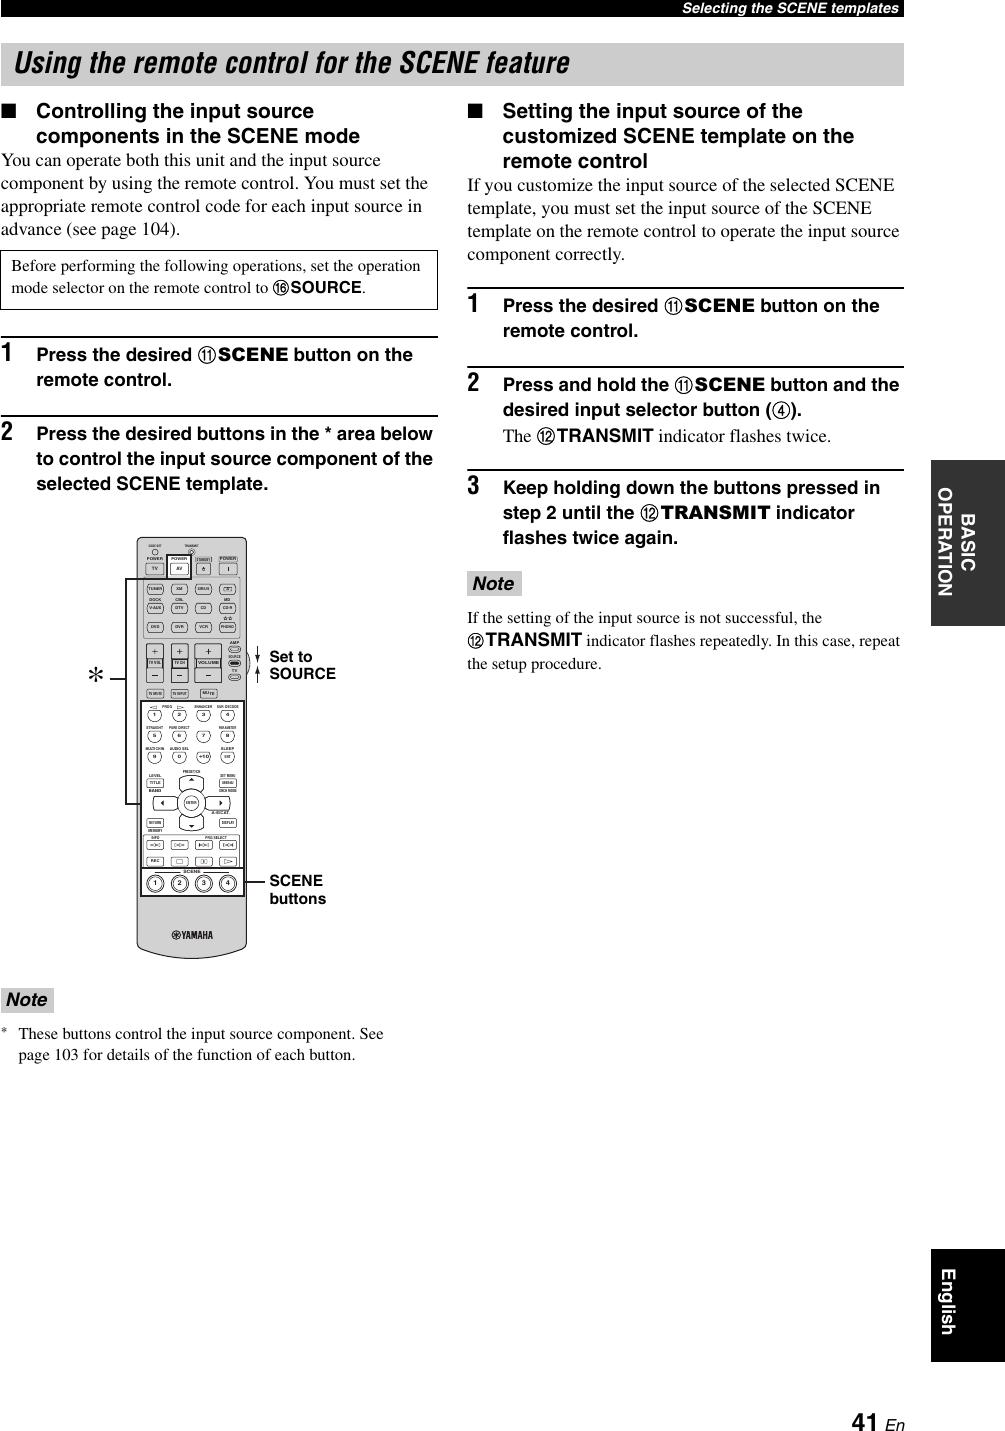 Yamaha Htr 6180 Users Manual